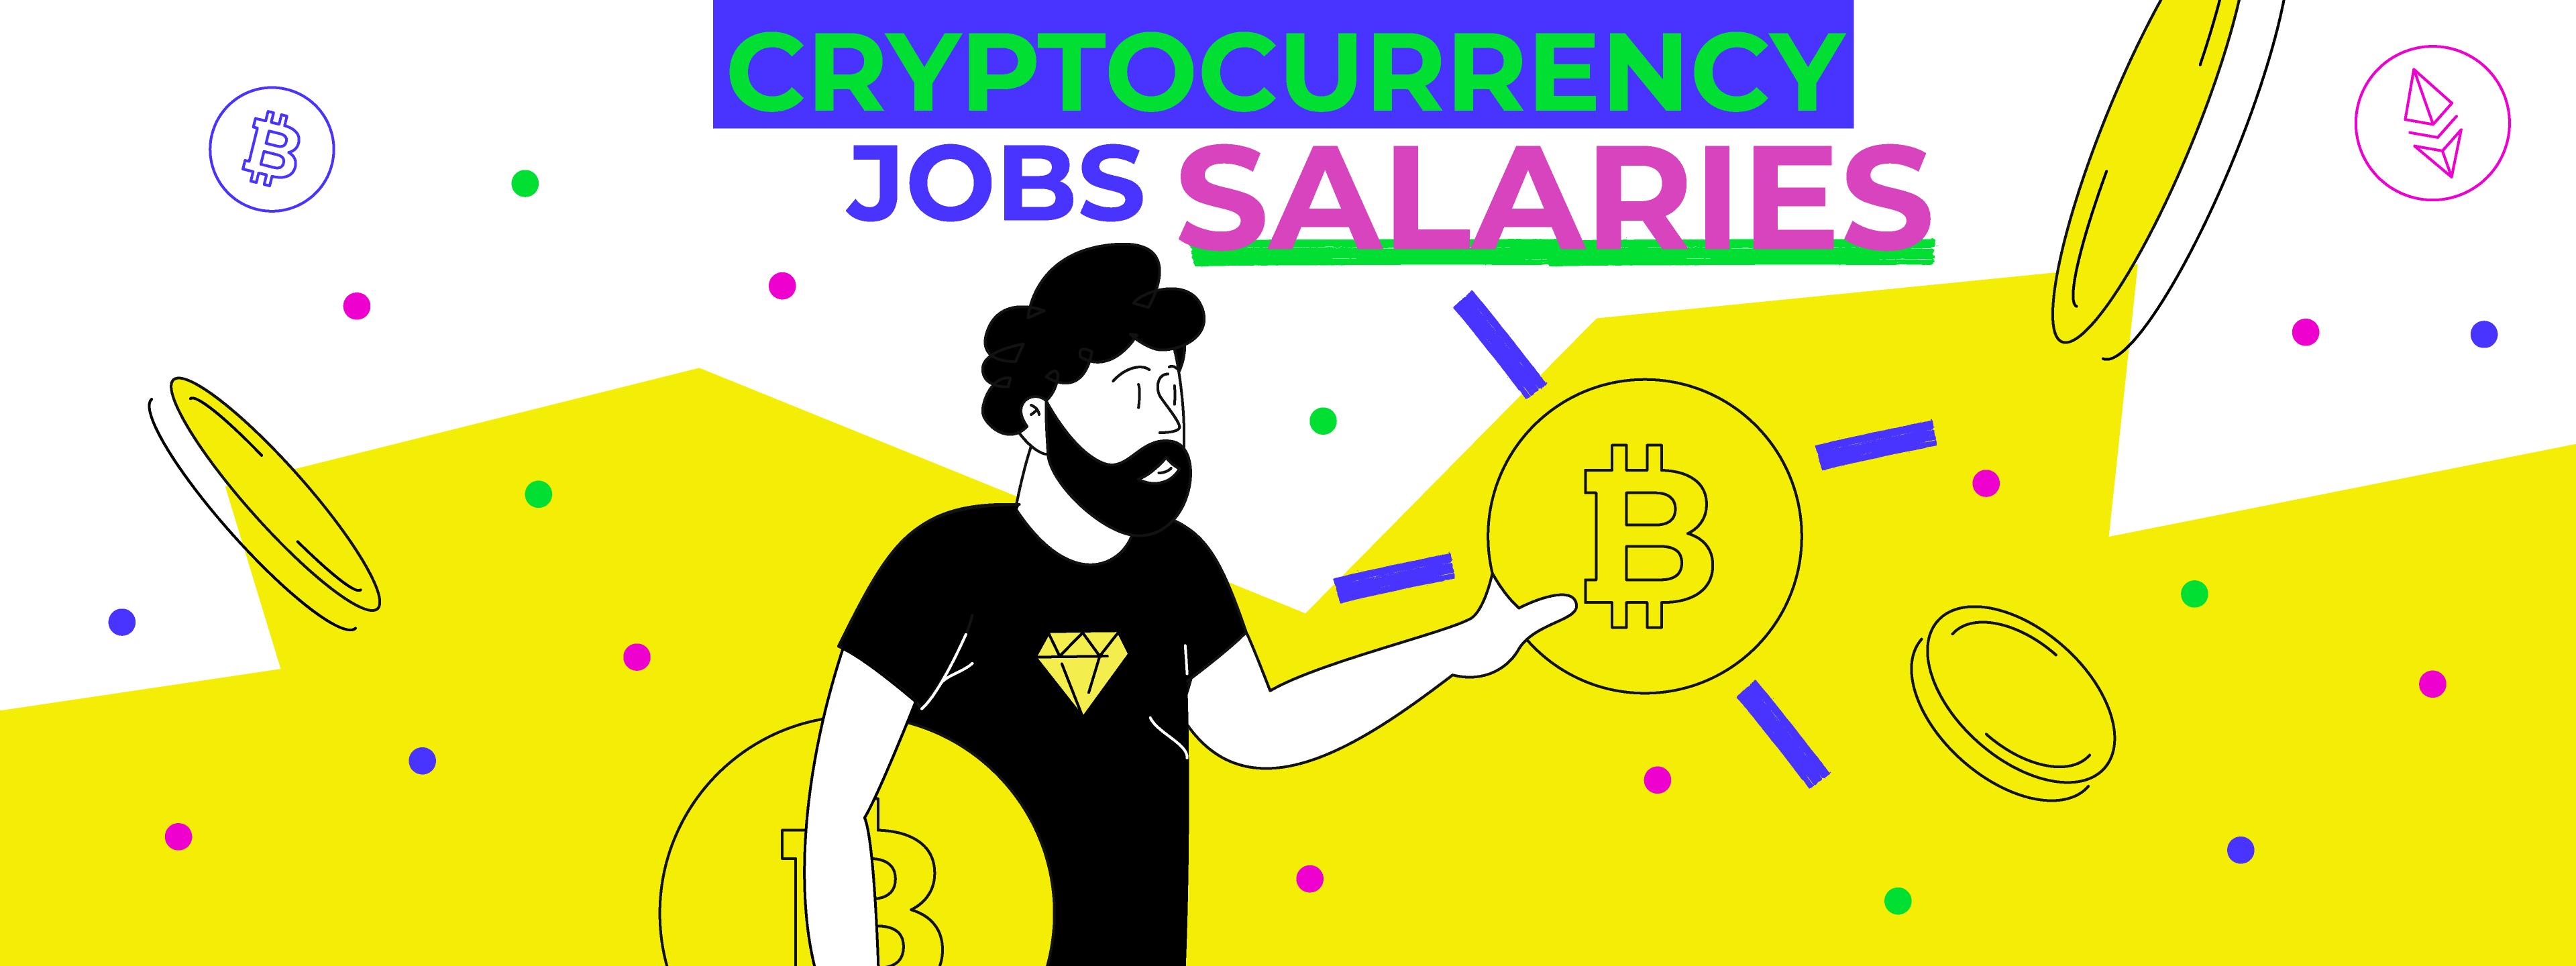 Cryptocurrency Jobs Salaries